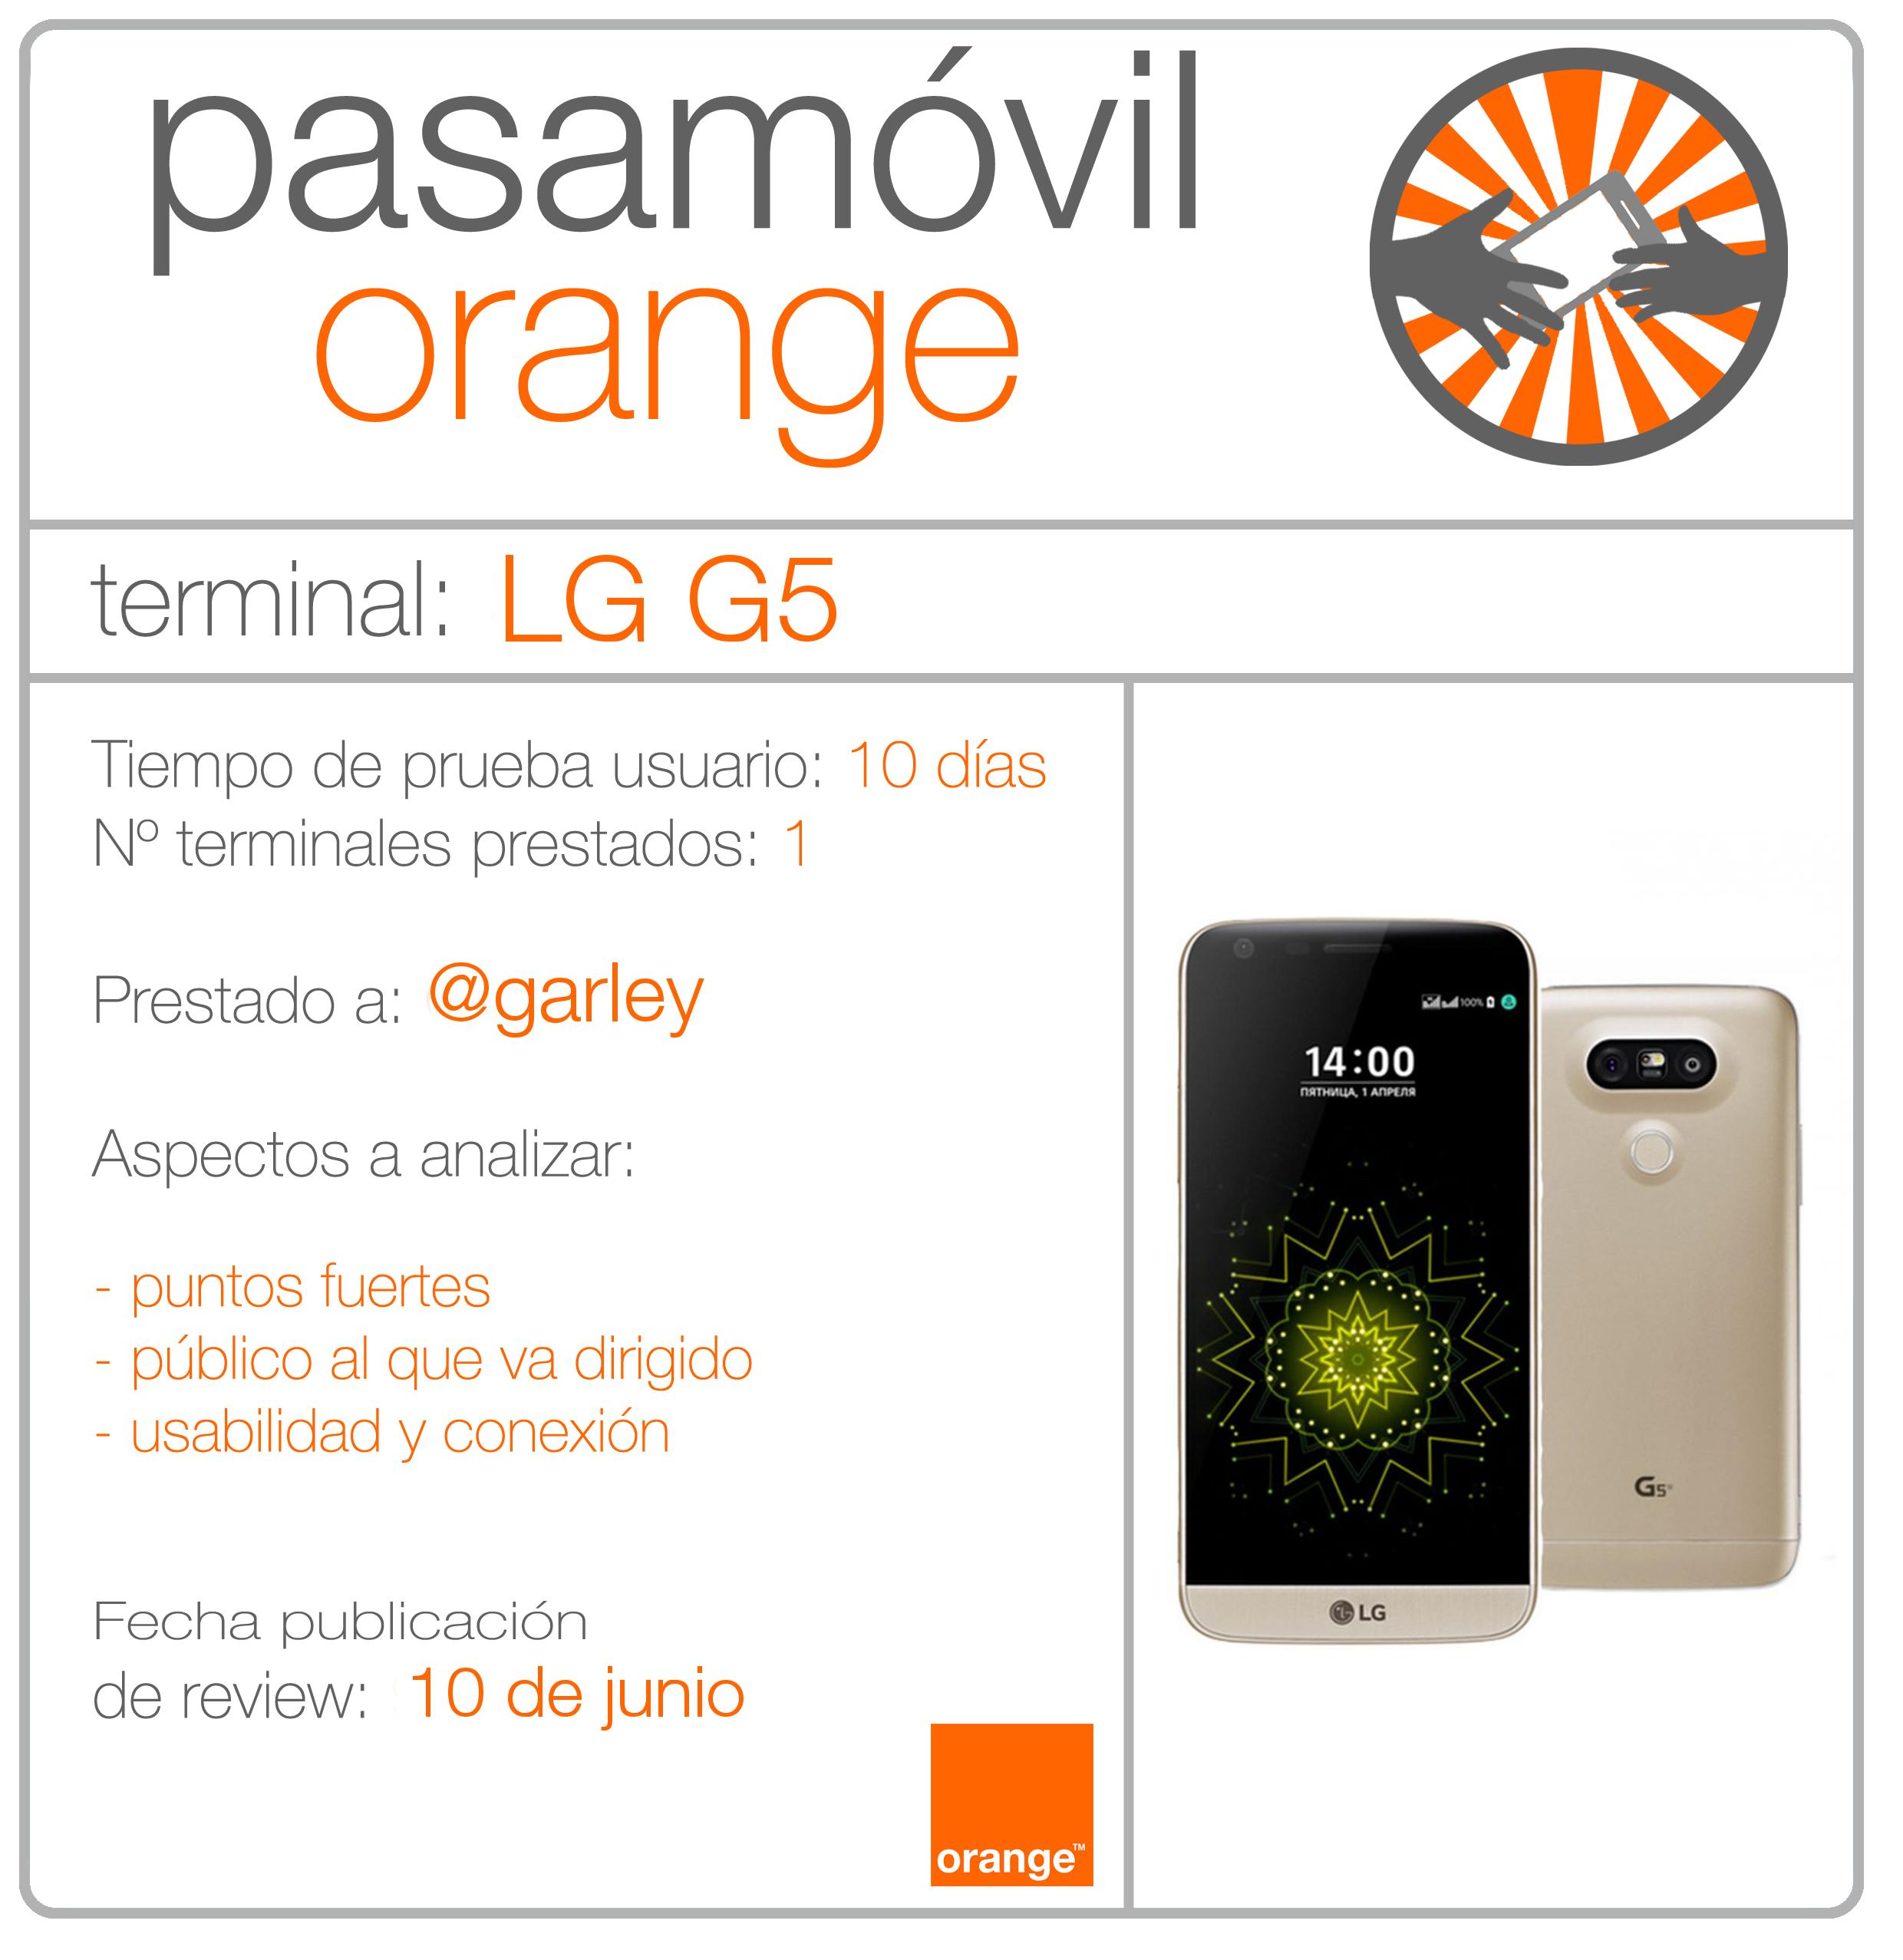 pasamovilfichaG5.png